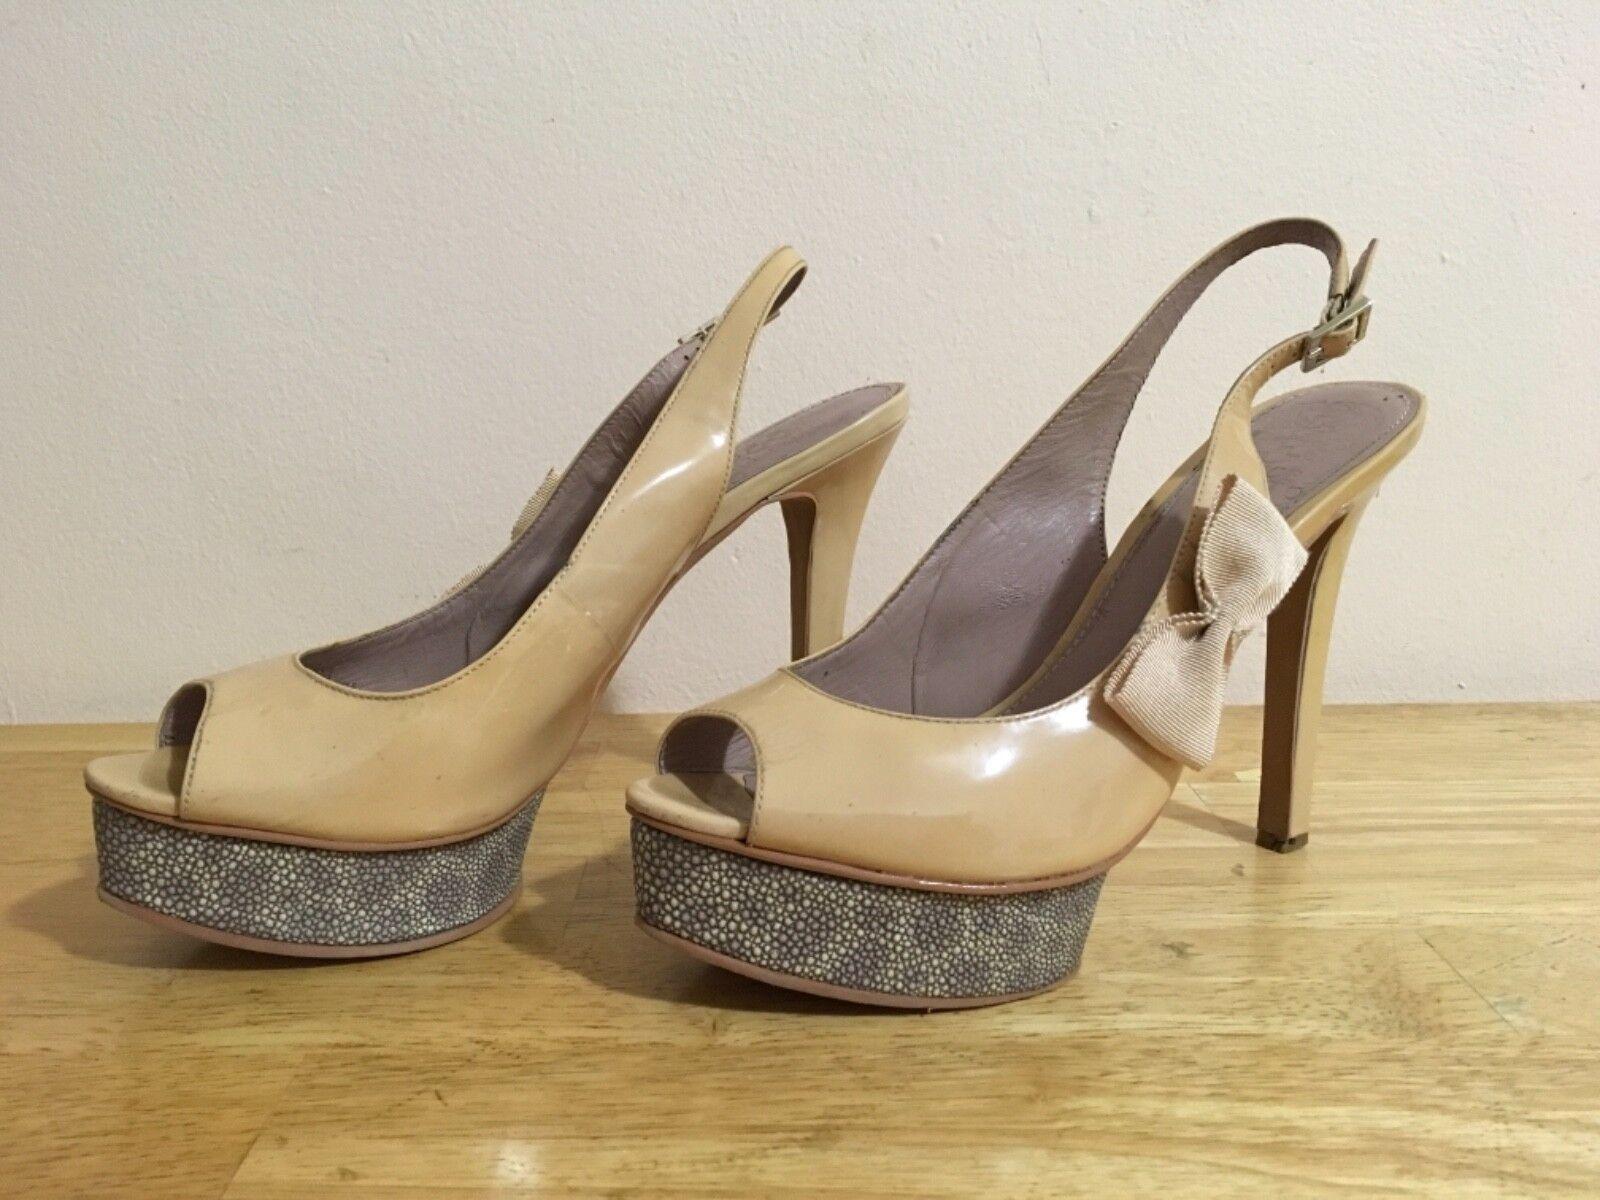 Ladies Beige Patent Leather Open Toe Platform Sandals Size 8.5